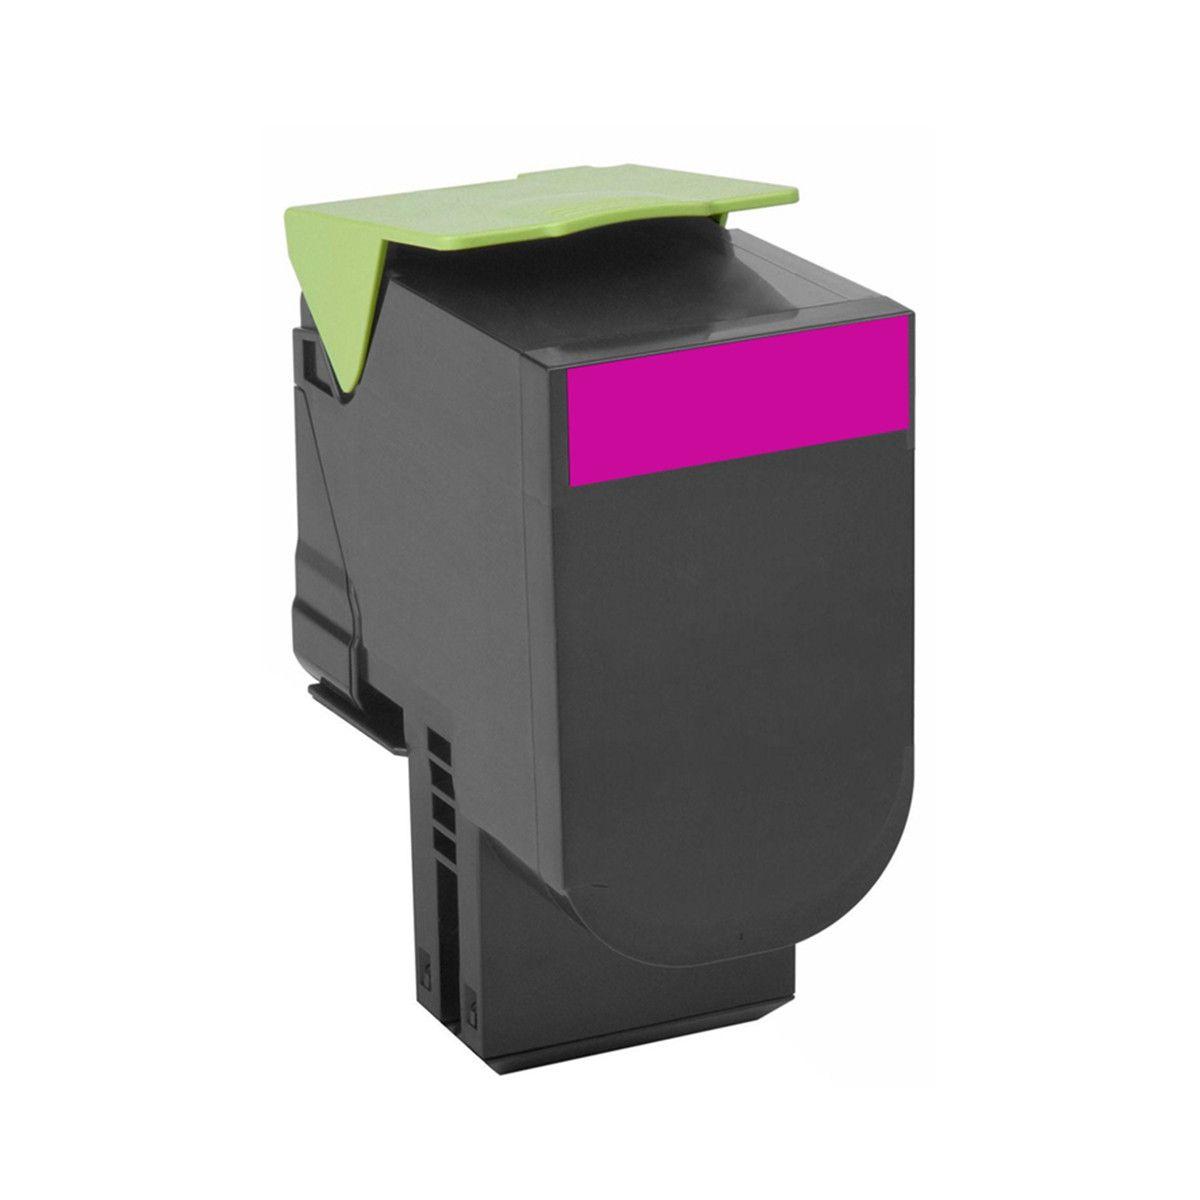 Toner Compatível Lexmark [80C8SM0] Magenta CX310/CX410/CX410dn/CX510 - 3.000 Páginas - Cartucho & Cia